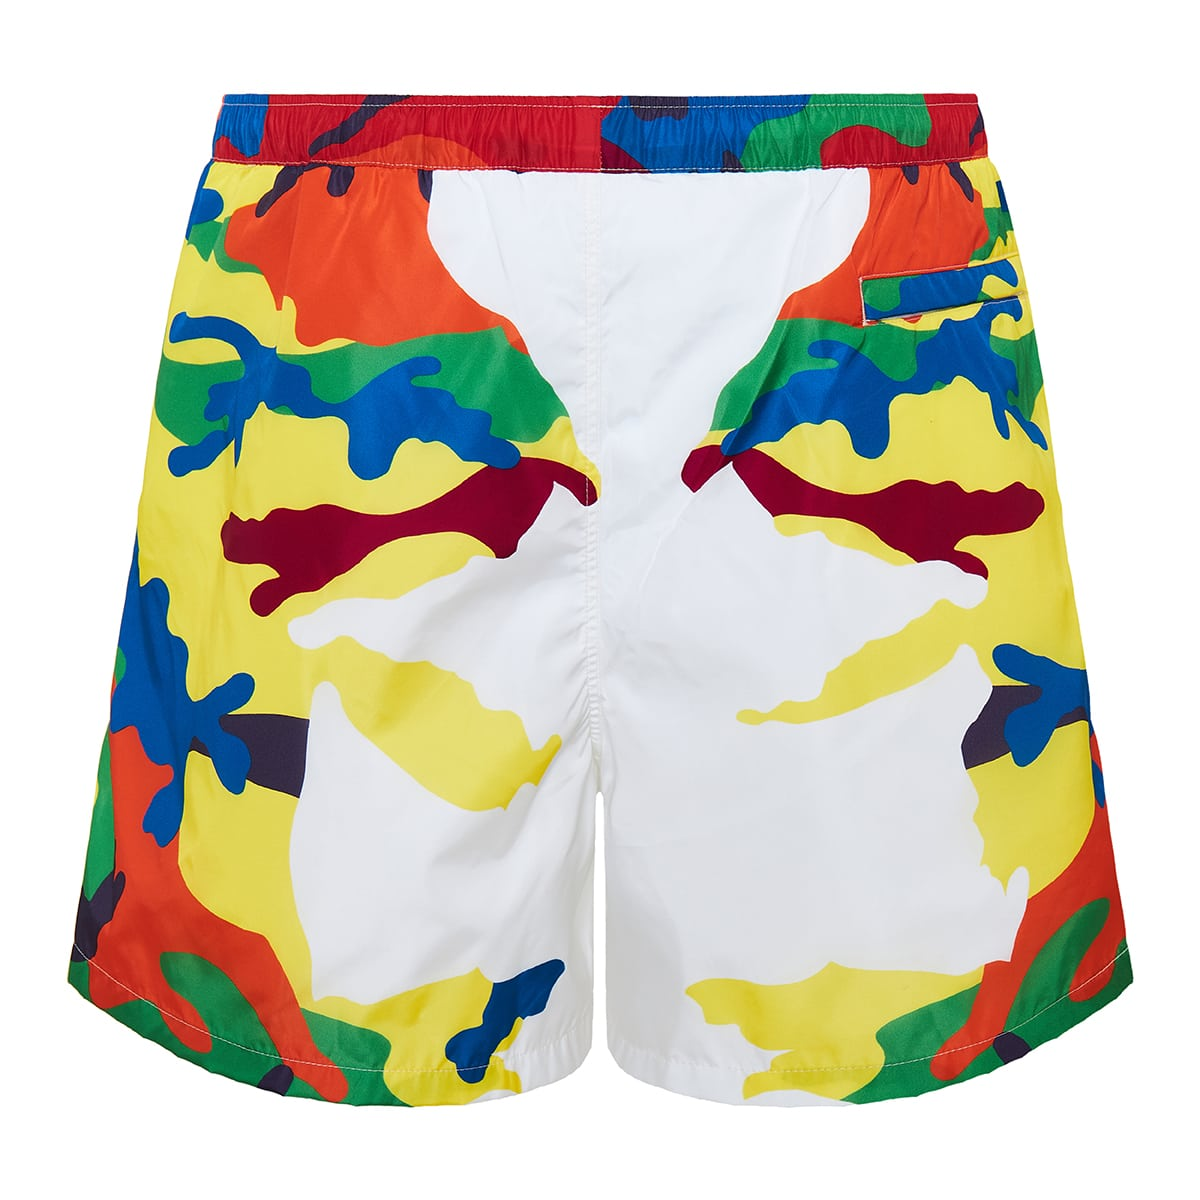 CAMOU7 printed swim shorts